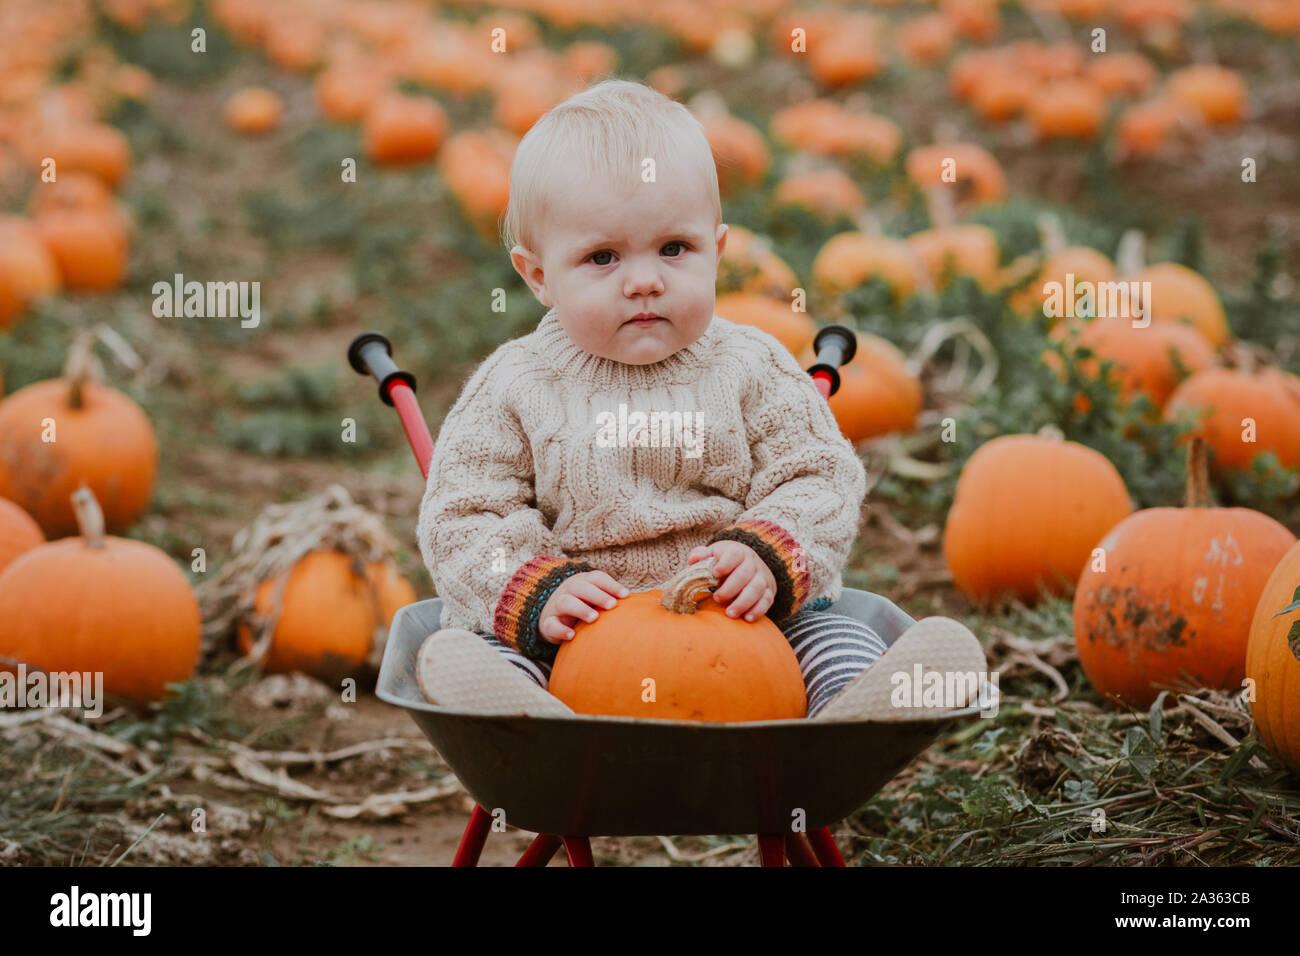 9 month old boy pumpkin picking Stock Photo